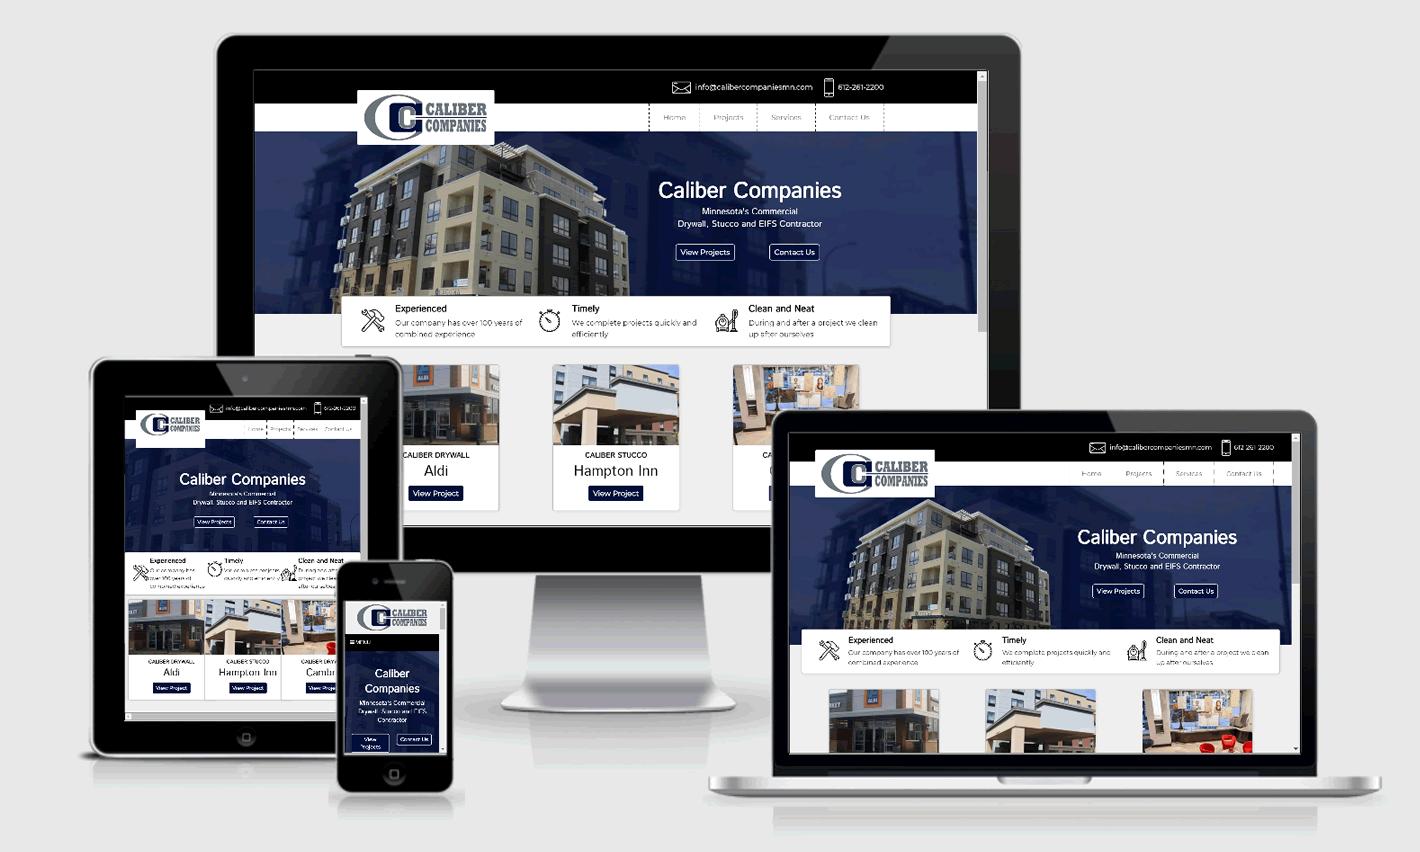 Caliber Companies Responsive Website Design